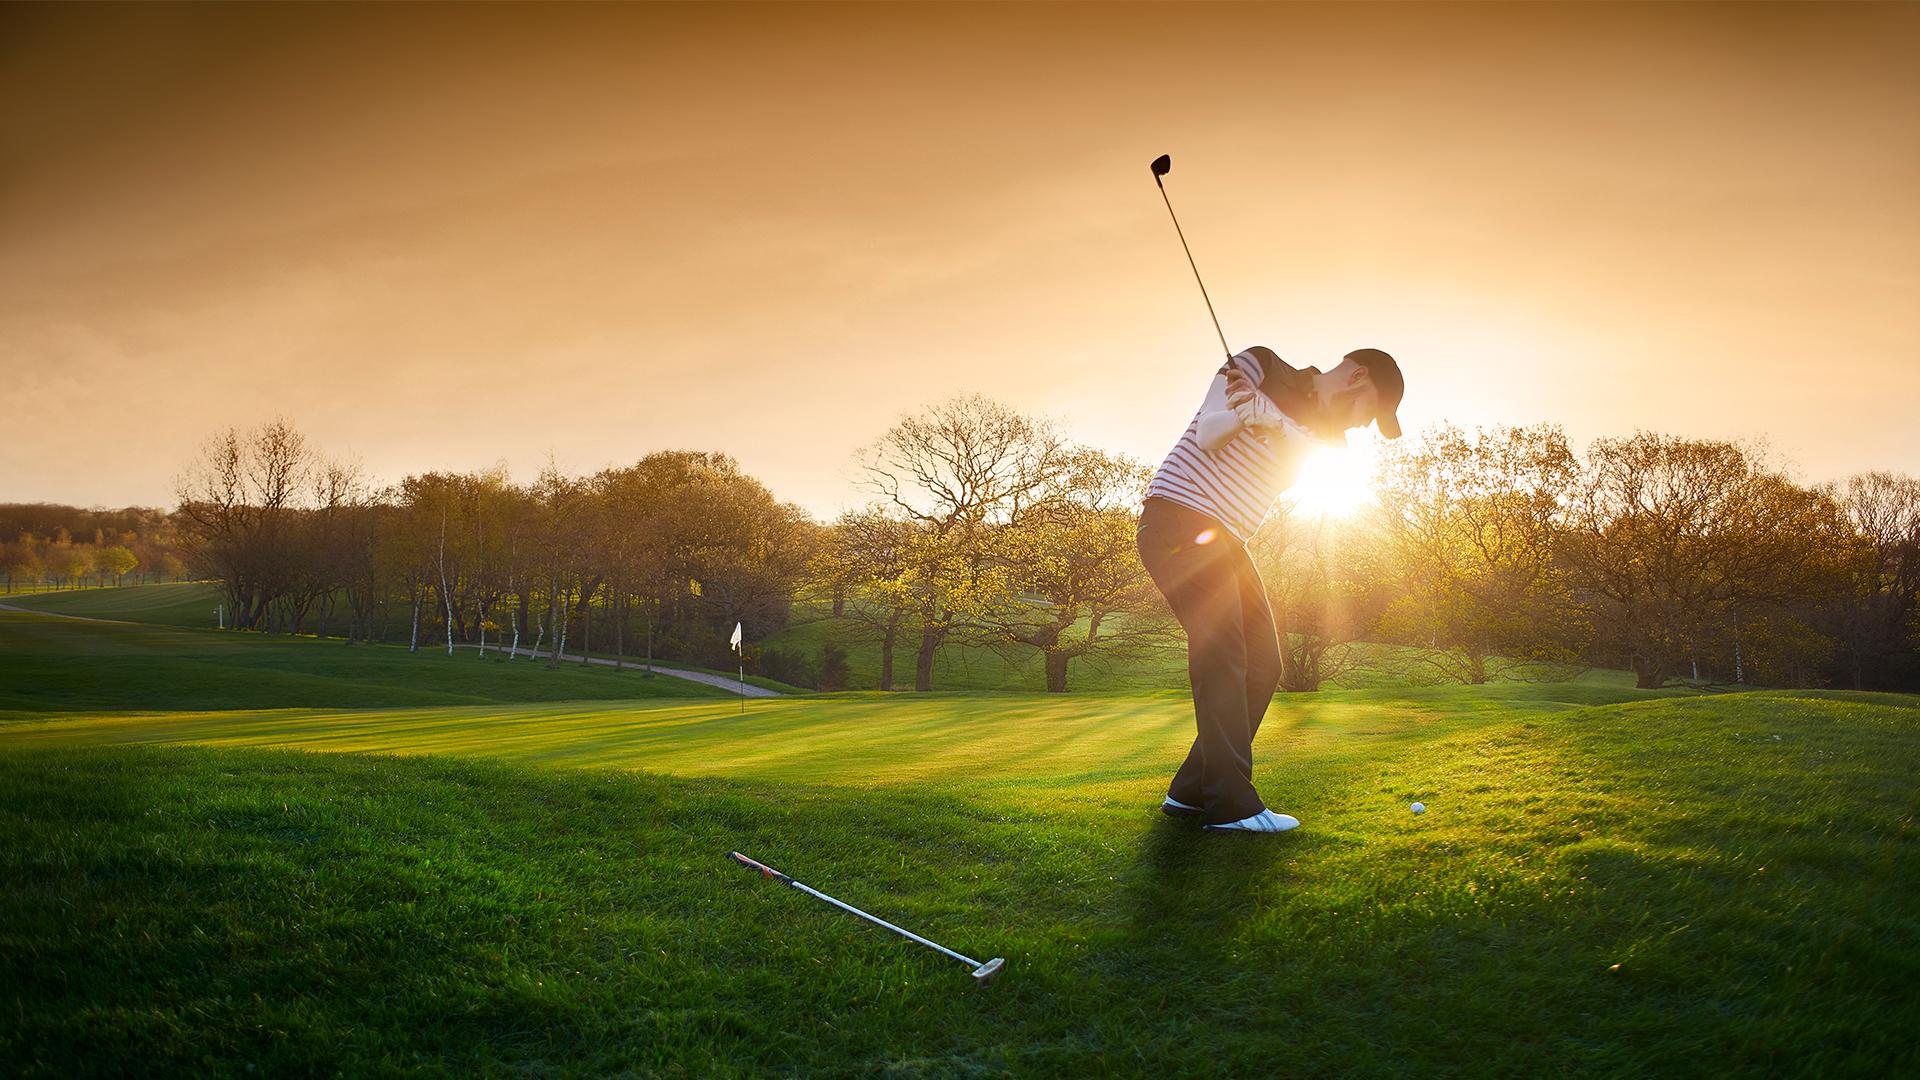 Golfer in sunset